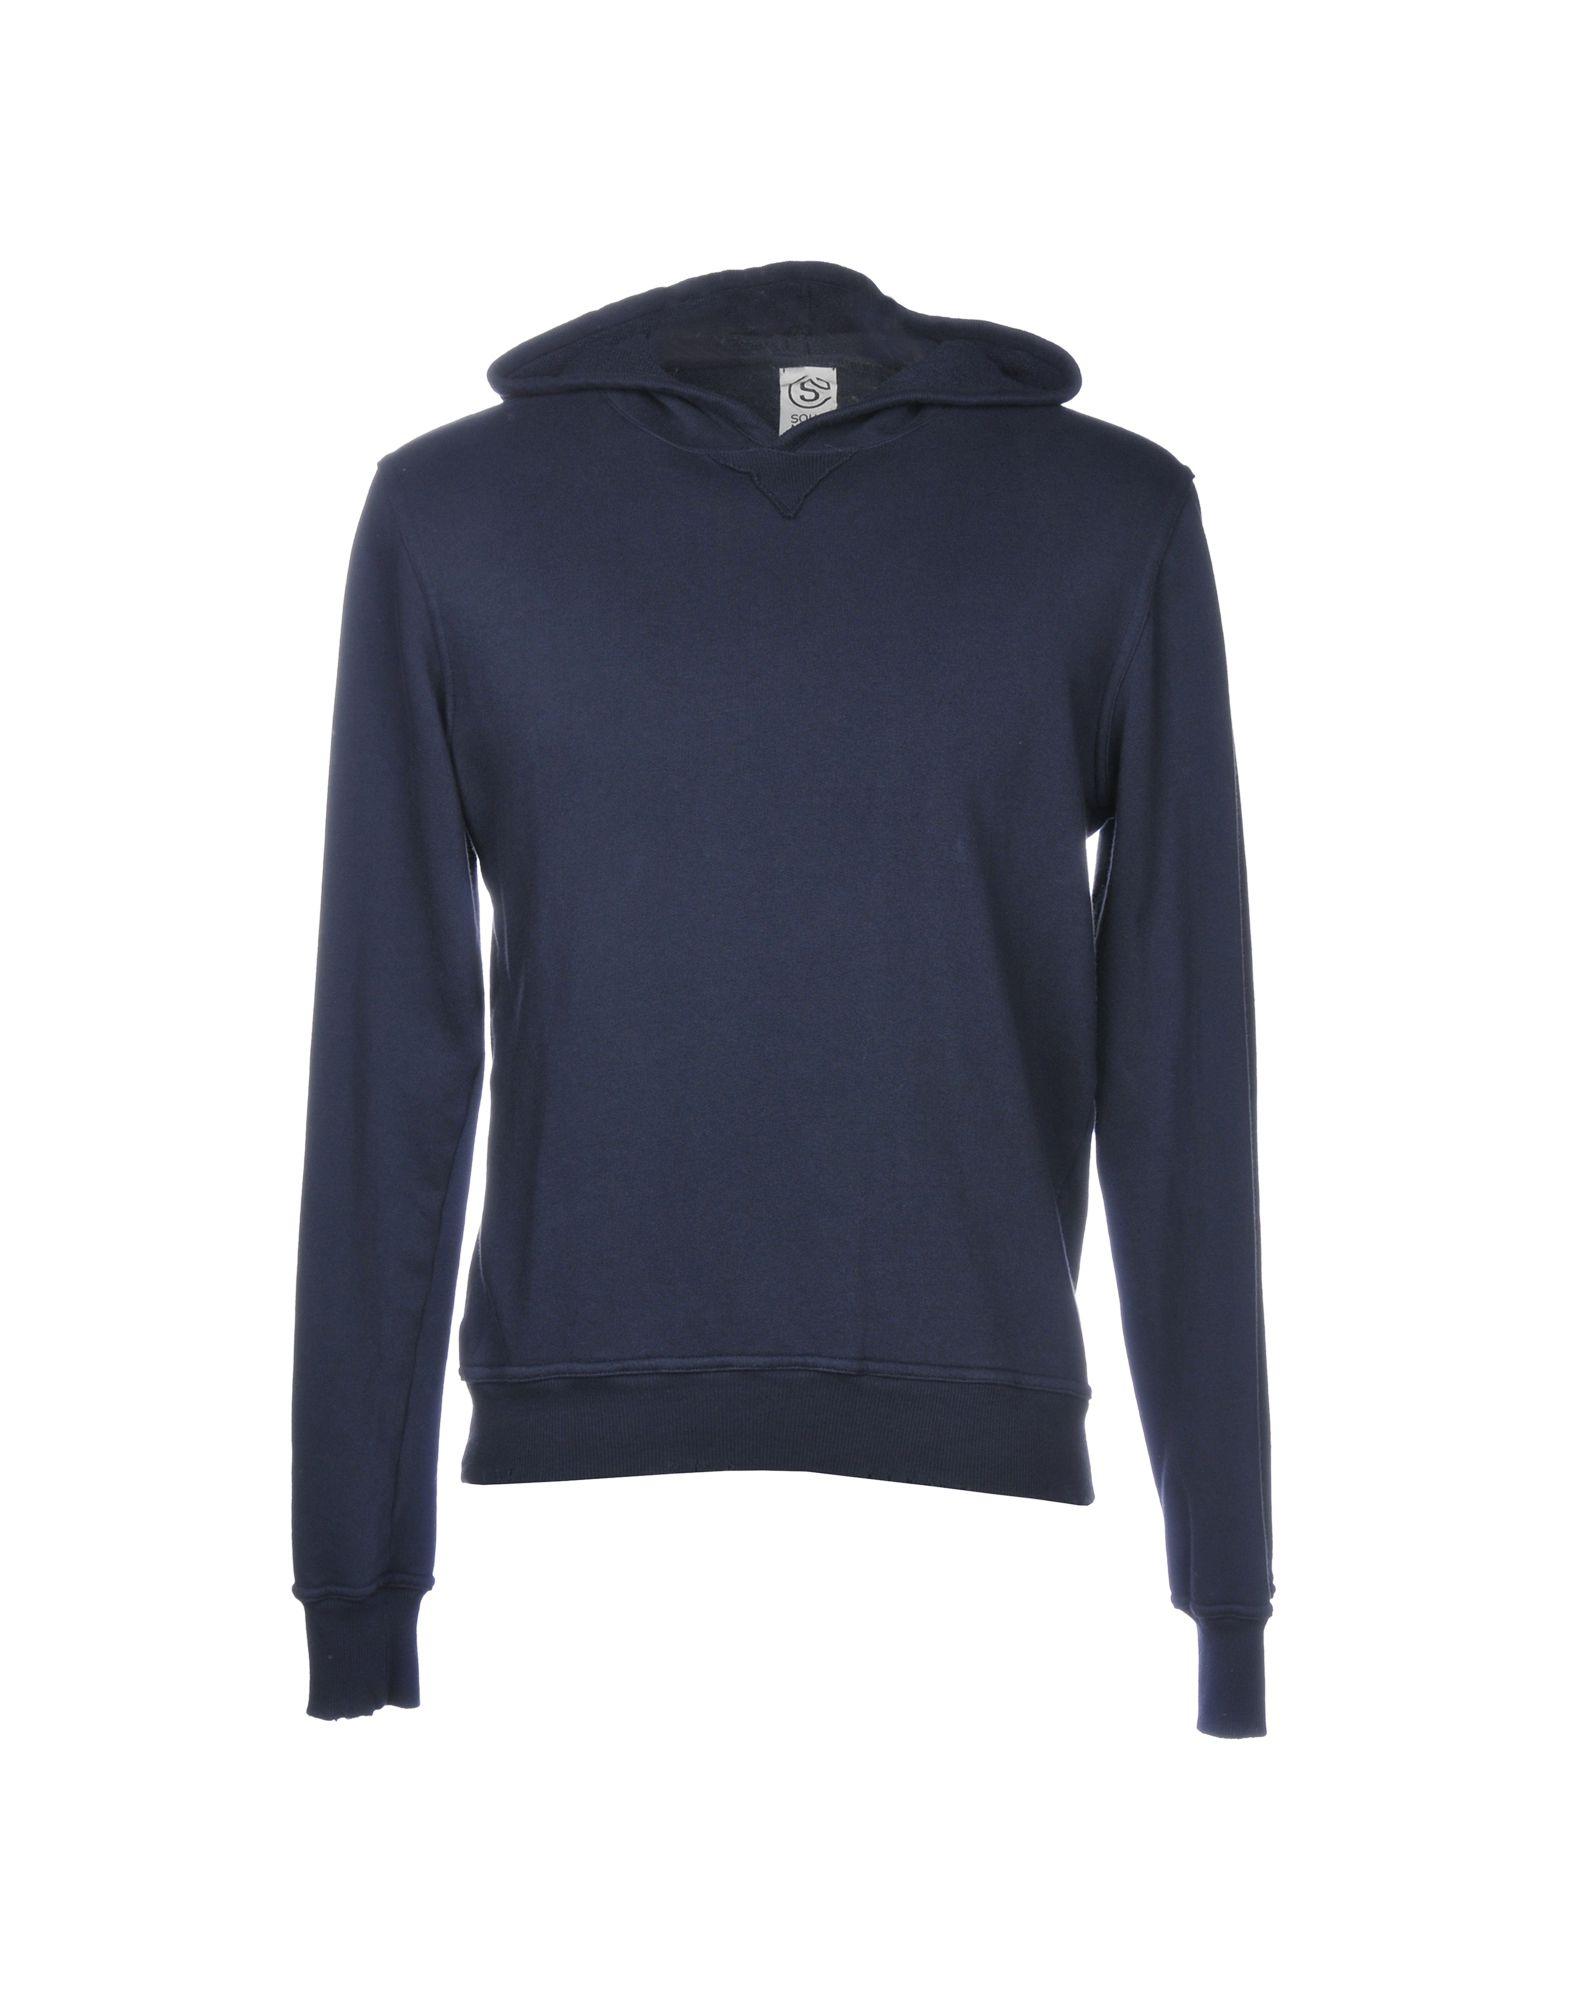 SOHO Hooded Sweatshirt in Dark Blue